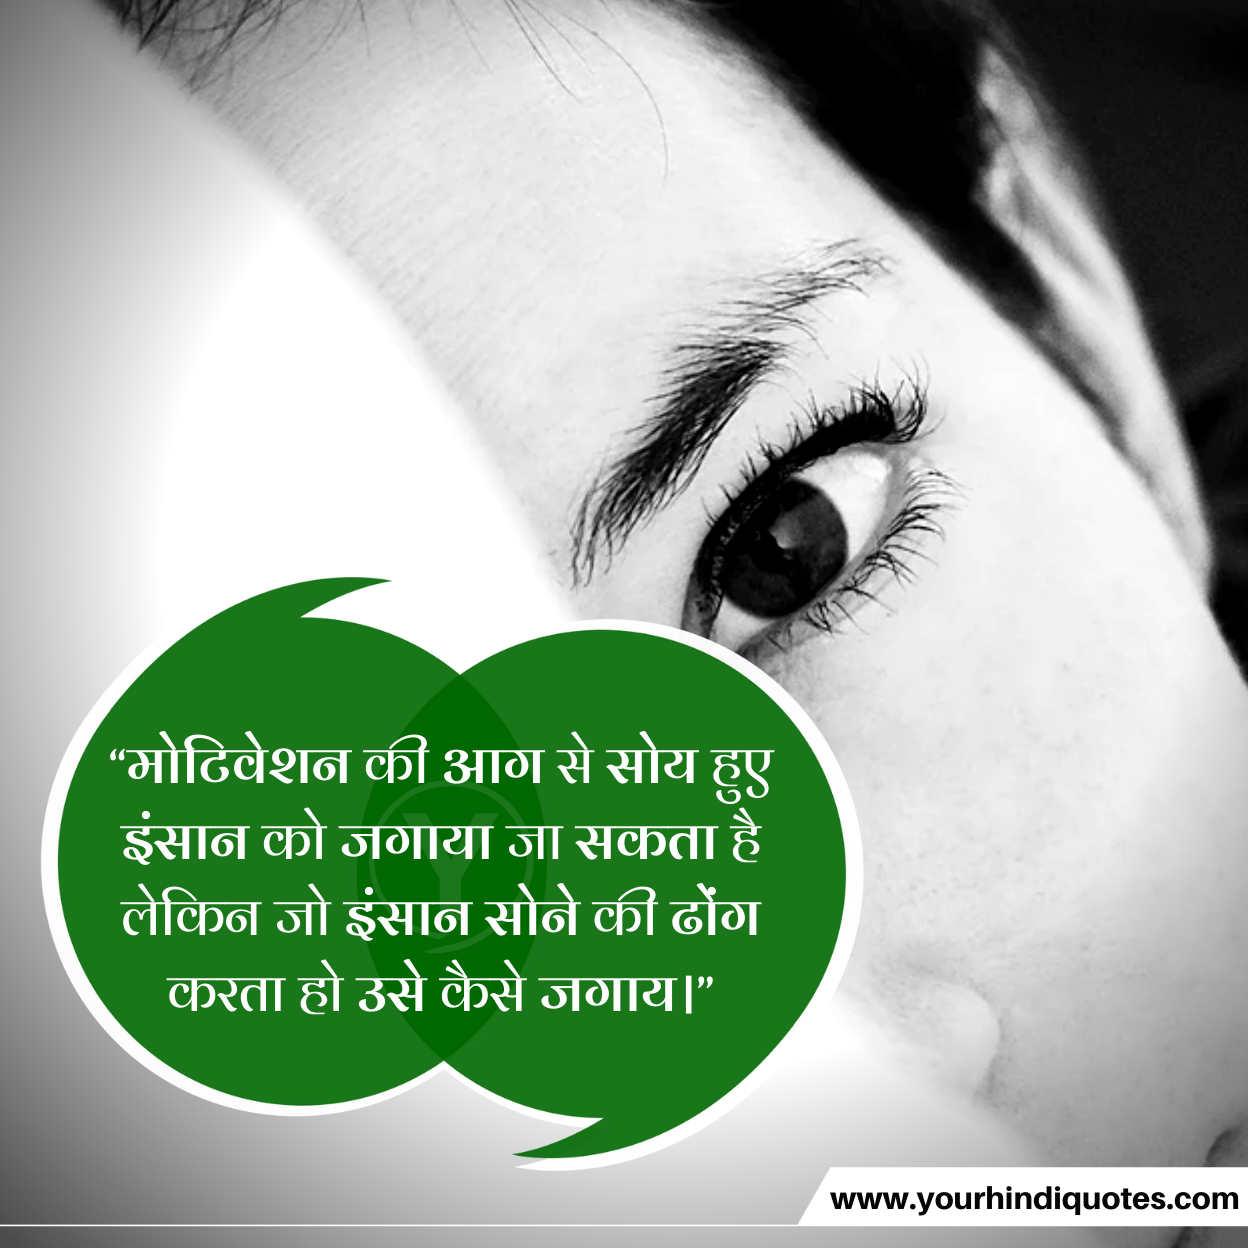 Hindi Motivational Thoughts Image